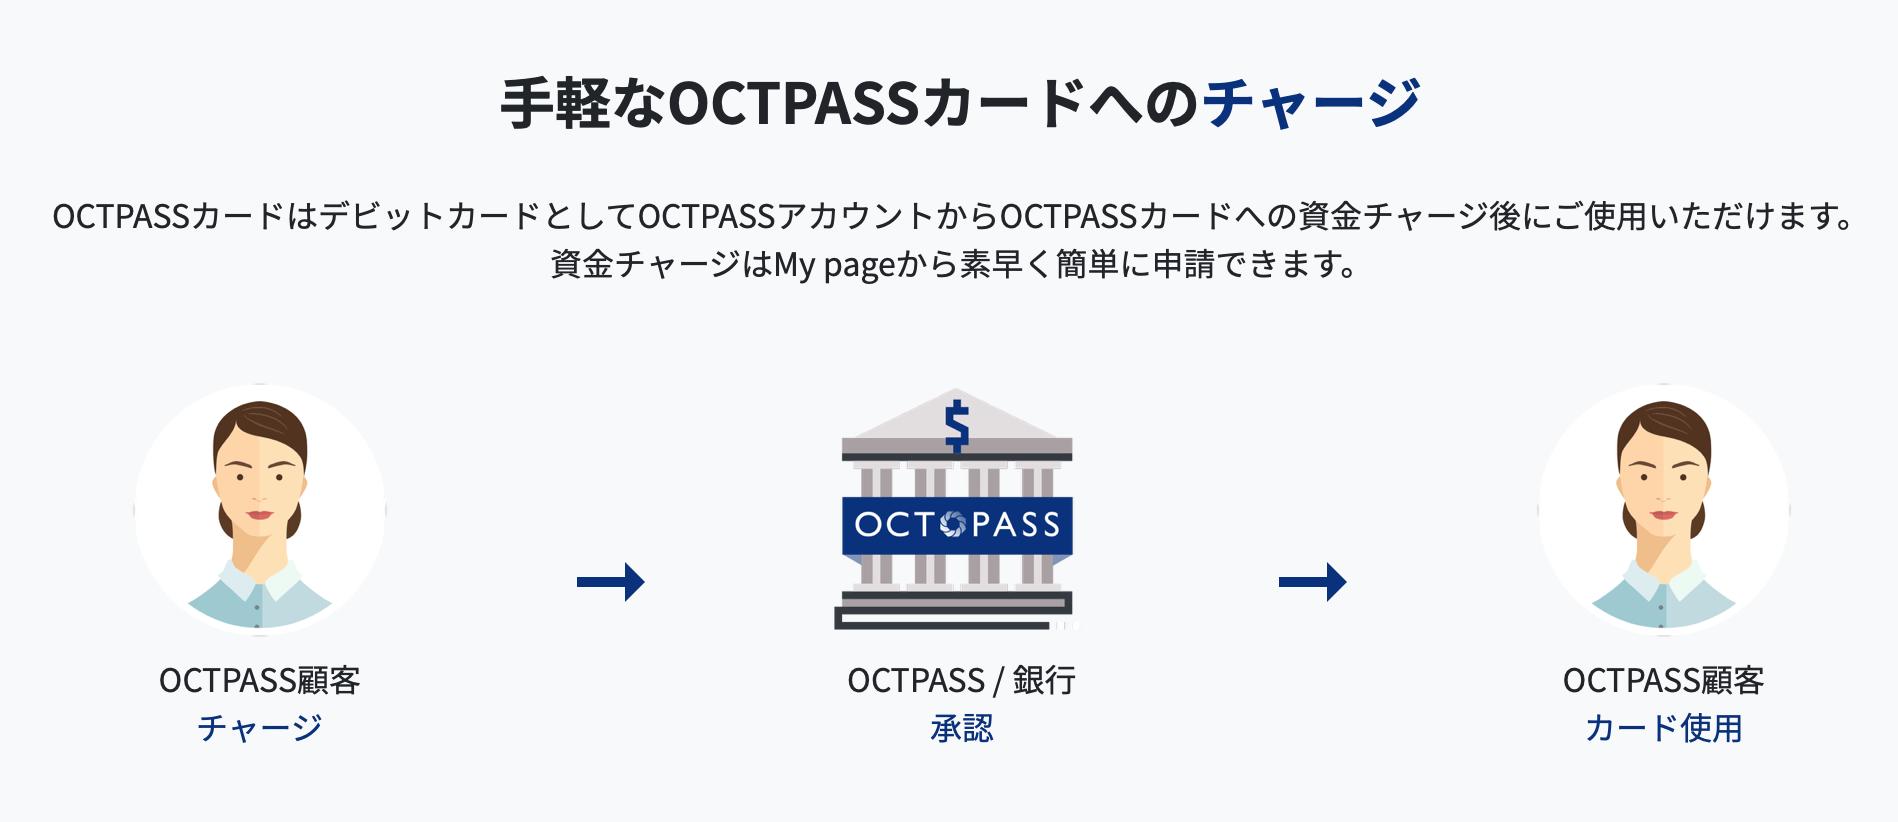 OCTPASSカードへの仮想通貨(暗号資産)のチャージ OCTPASSカードはデビットカードとしてOCTPASSアカウントからOCTPASSカードへの仮想通貨(暗号資産)といった資金チャージ後にご使用いただけます。 仮想通貨(暗号資産)といった資金チャージはMy pageから素早く簡単に申請できます。